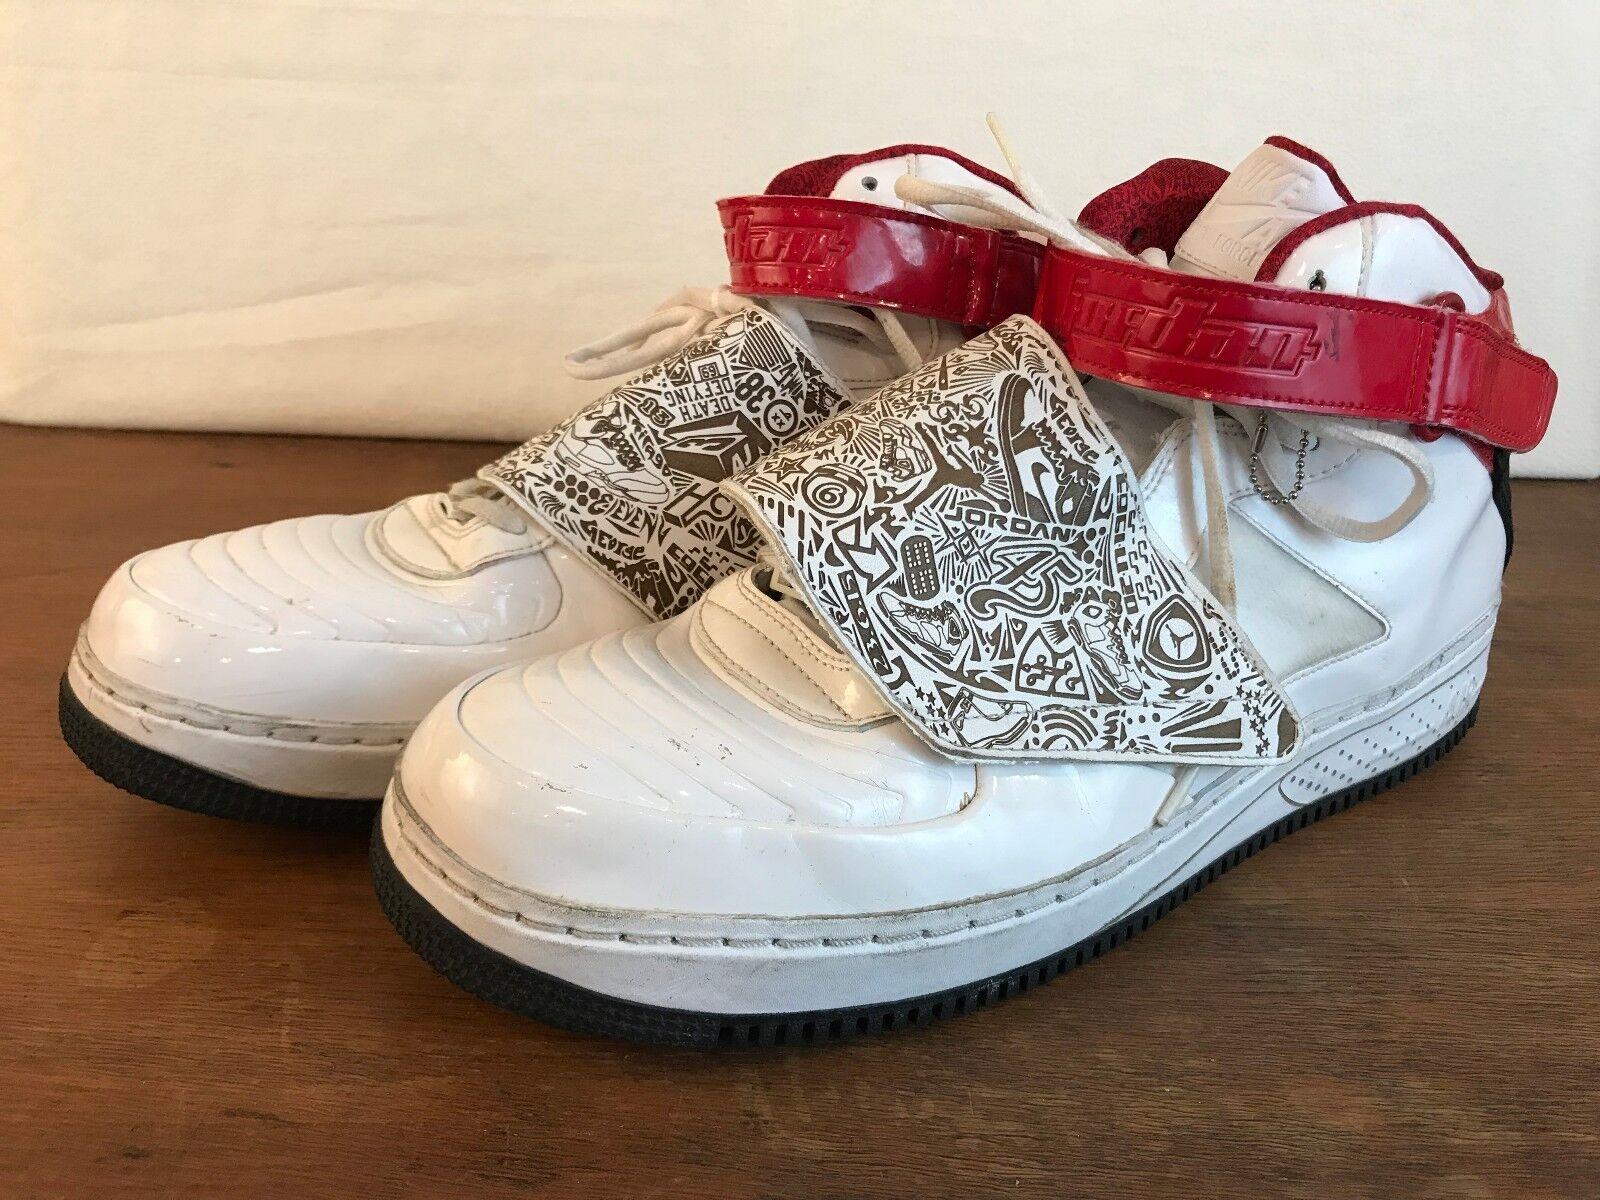 Nike Air Jordan AJF 20 2009 White Black Varsity Red Mens Size 15 331823 101